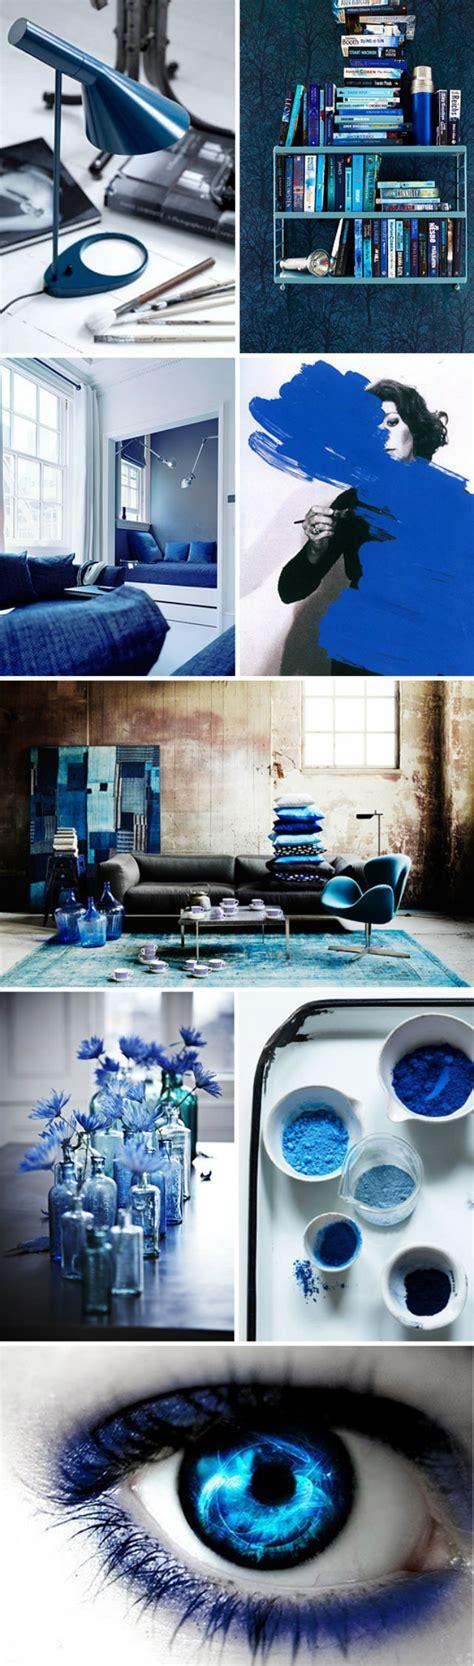 Blue Mood blue mood board inspiration inspiration